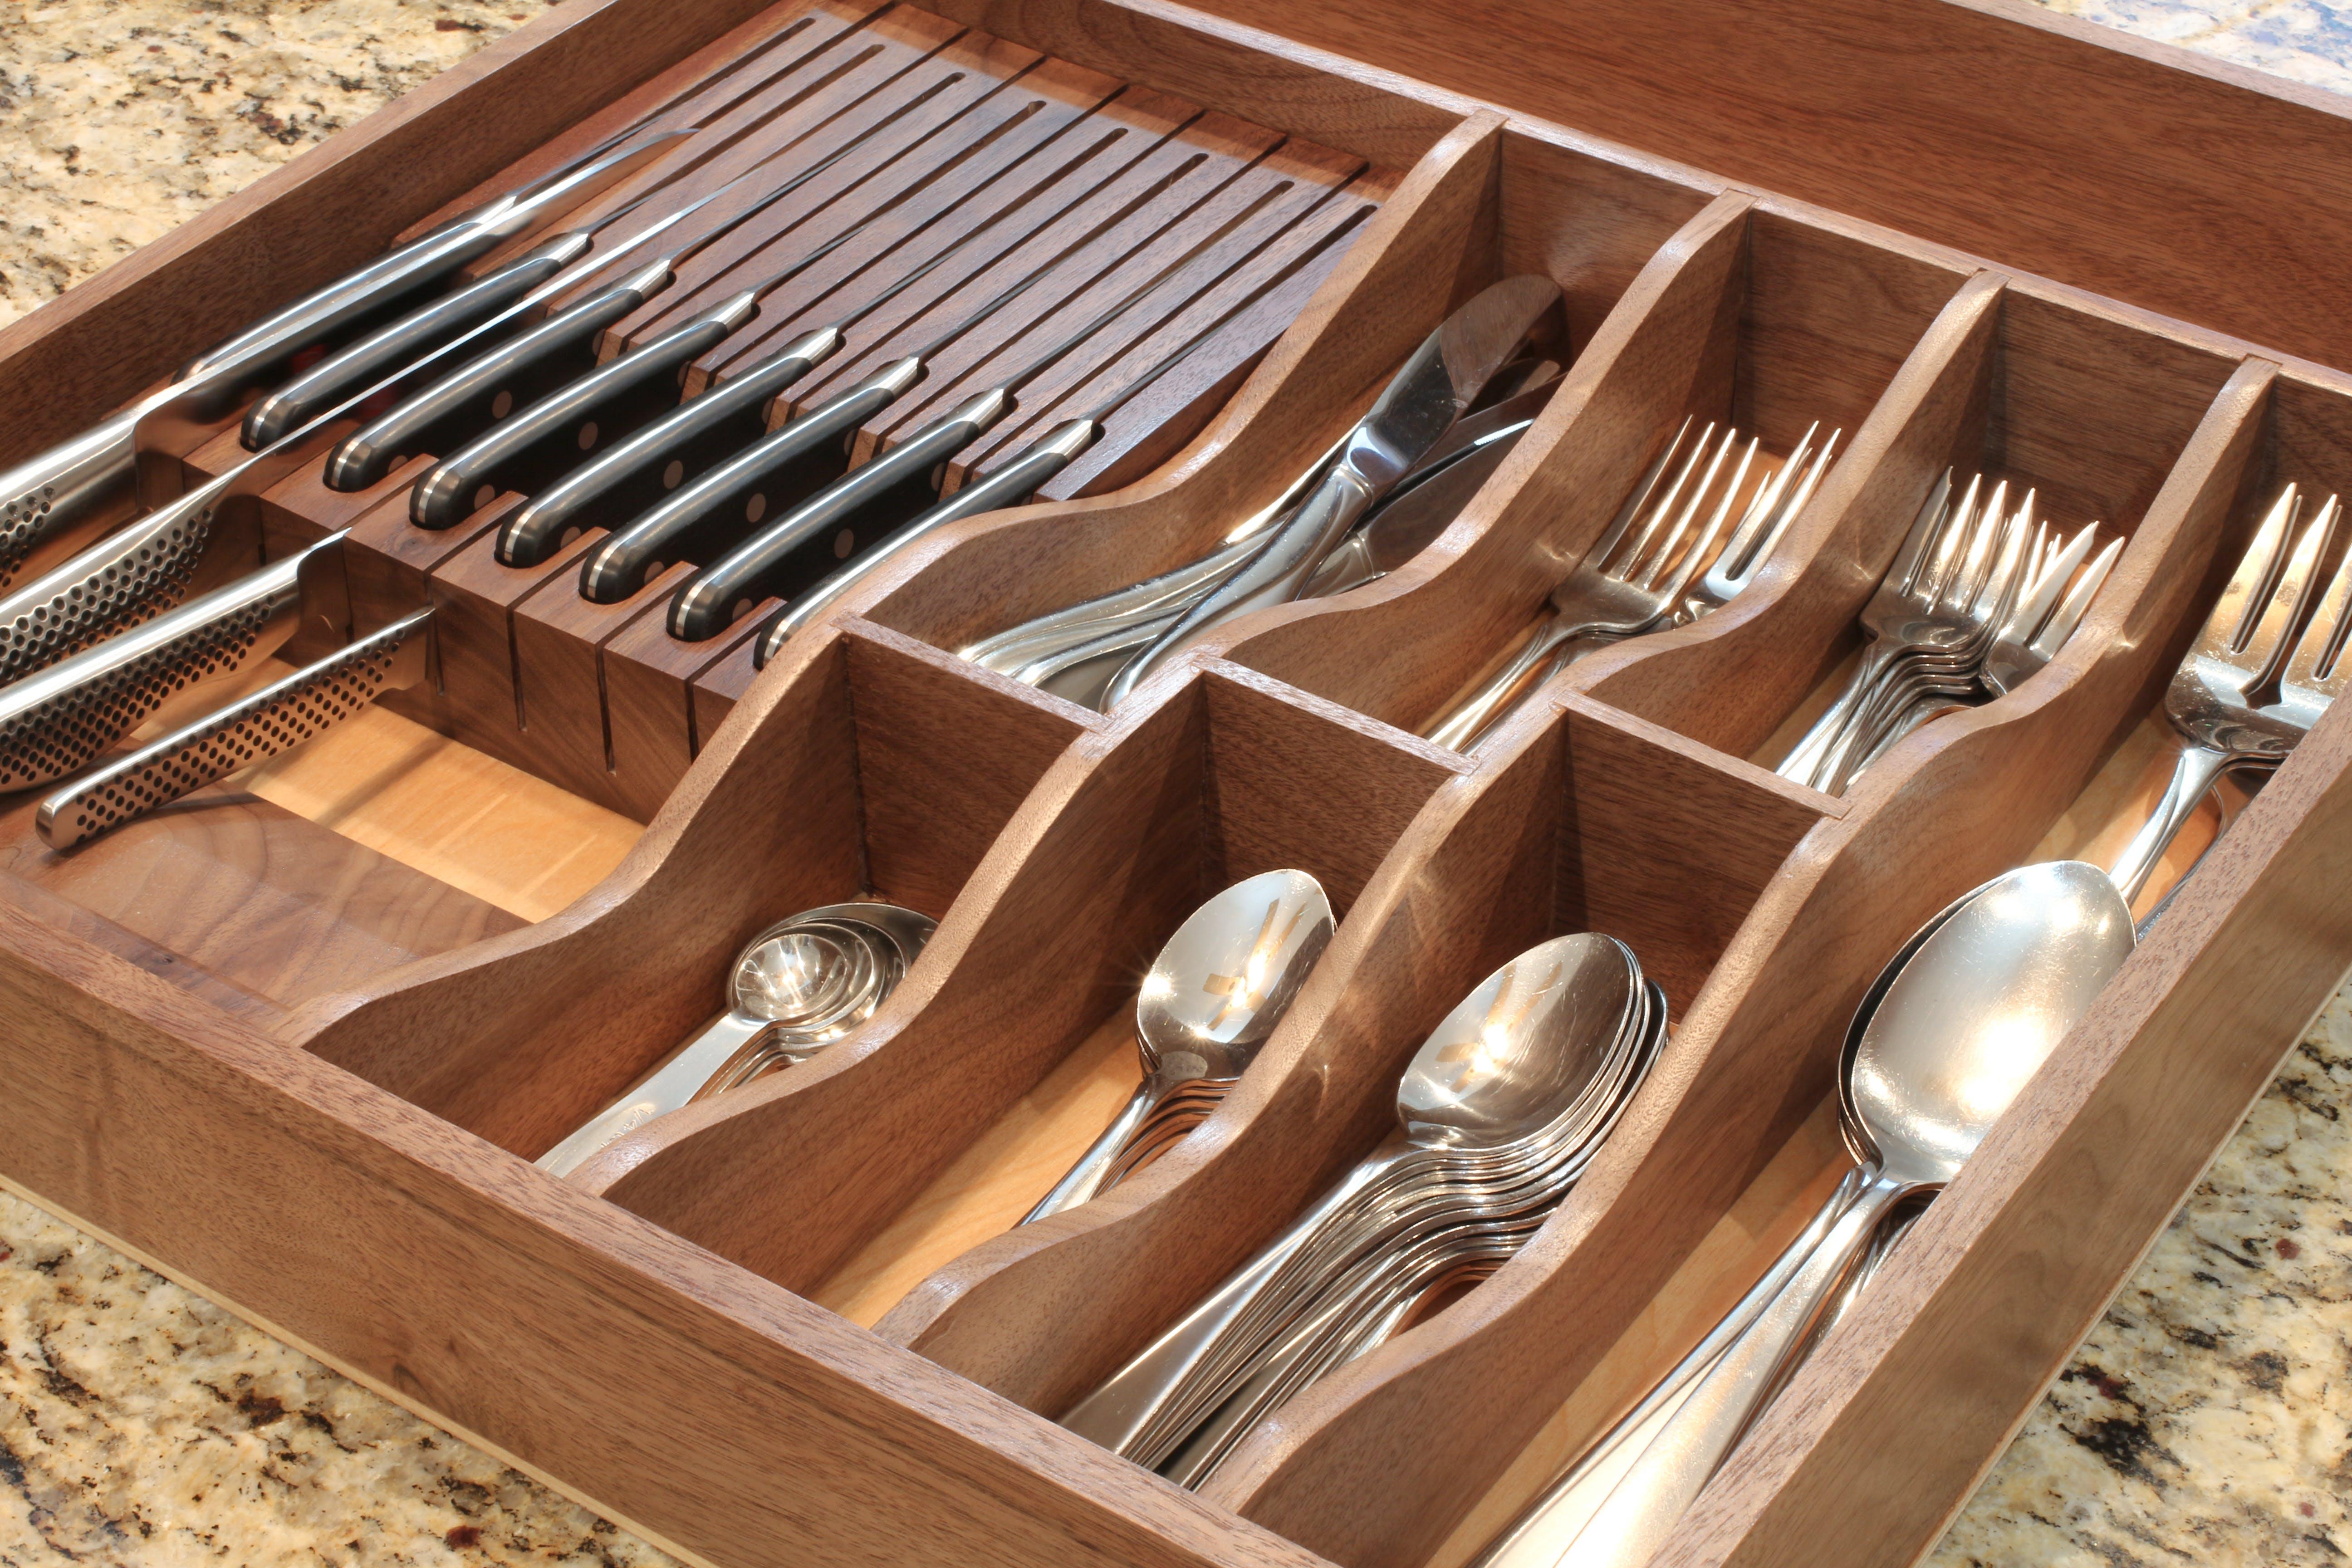 drawer, forks, knives